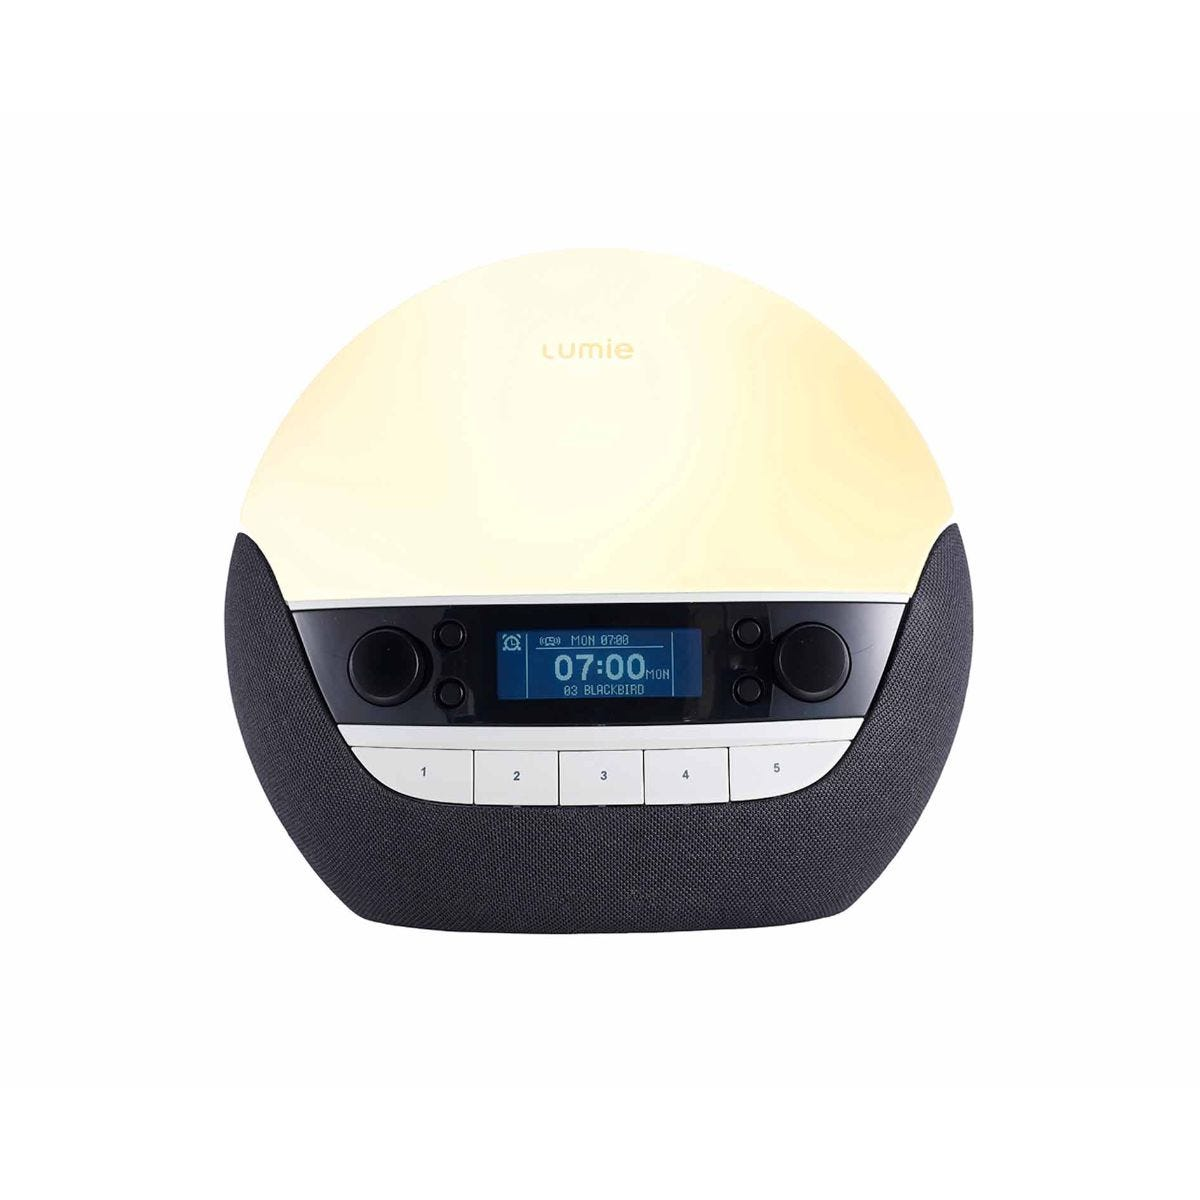 Image of Lumie Bodyclock Luxe 750D Wake-up Light Alarm Clock, Black